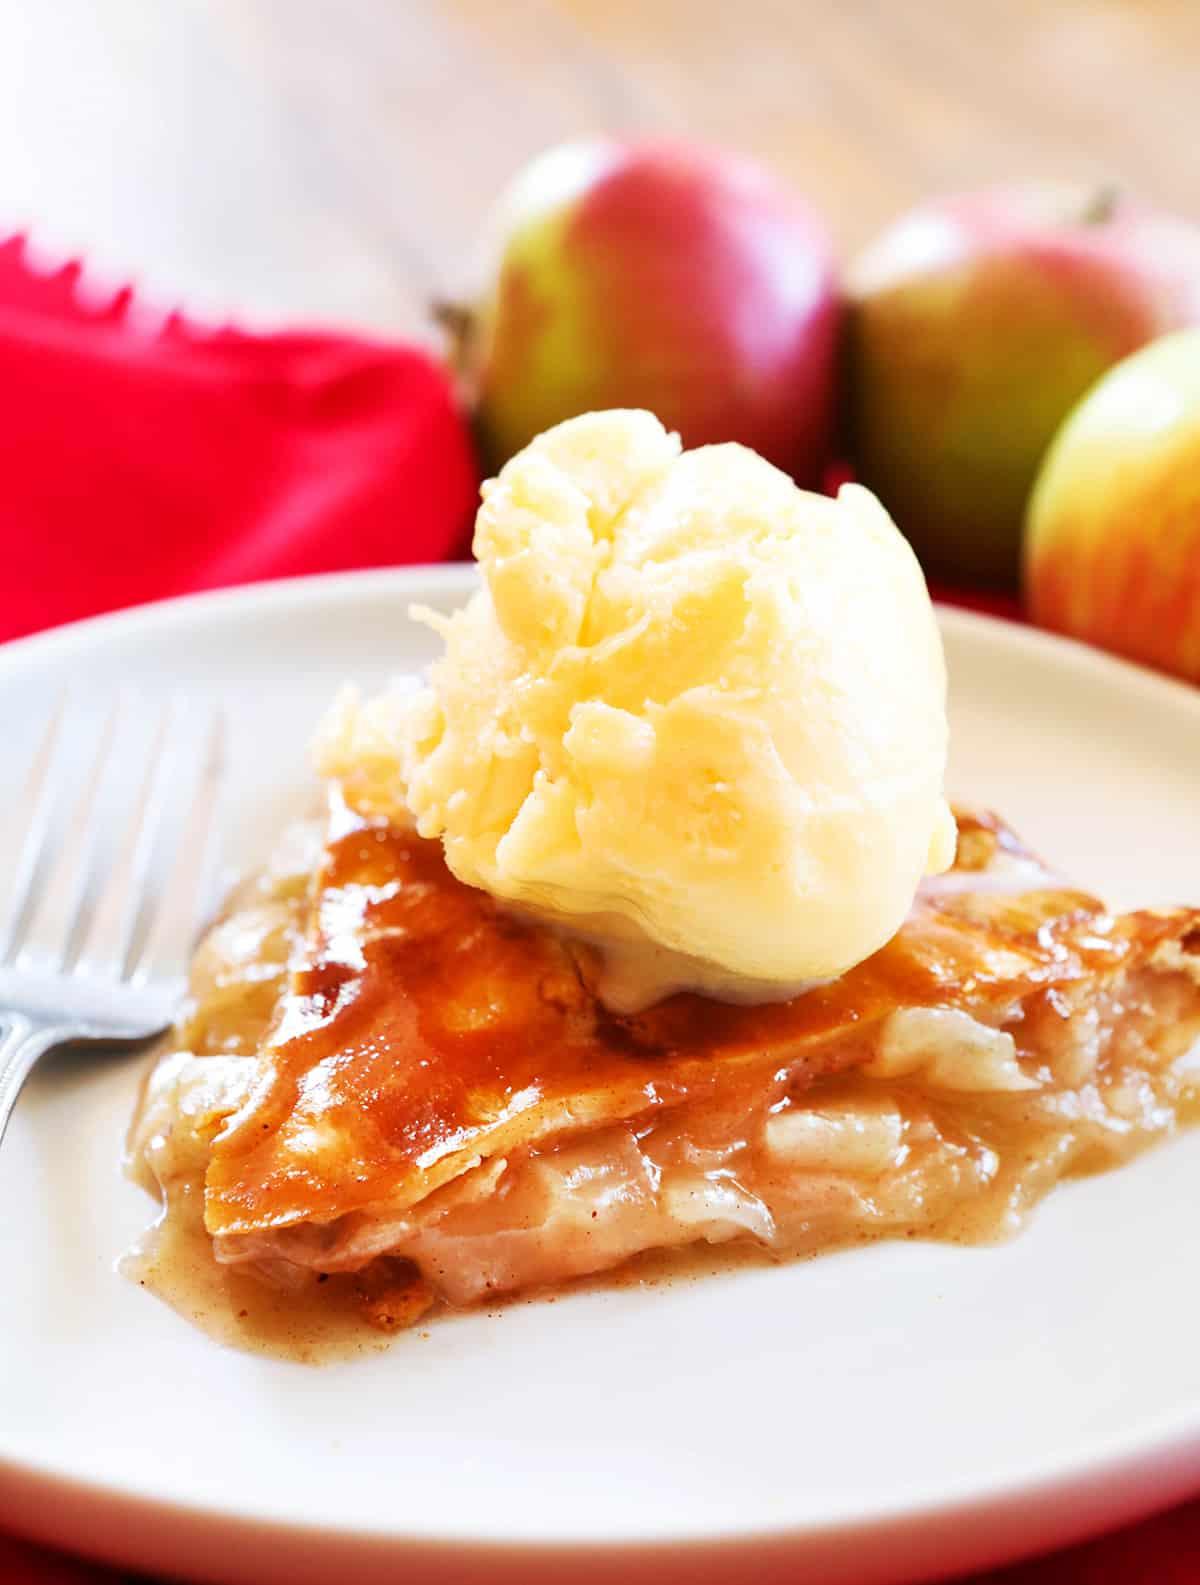 slice of easy apple pie with a scoop of vanilla ice cream on top.